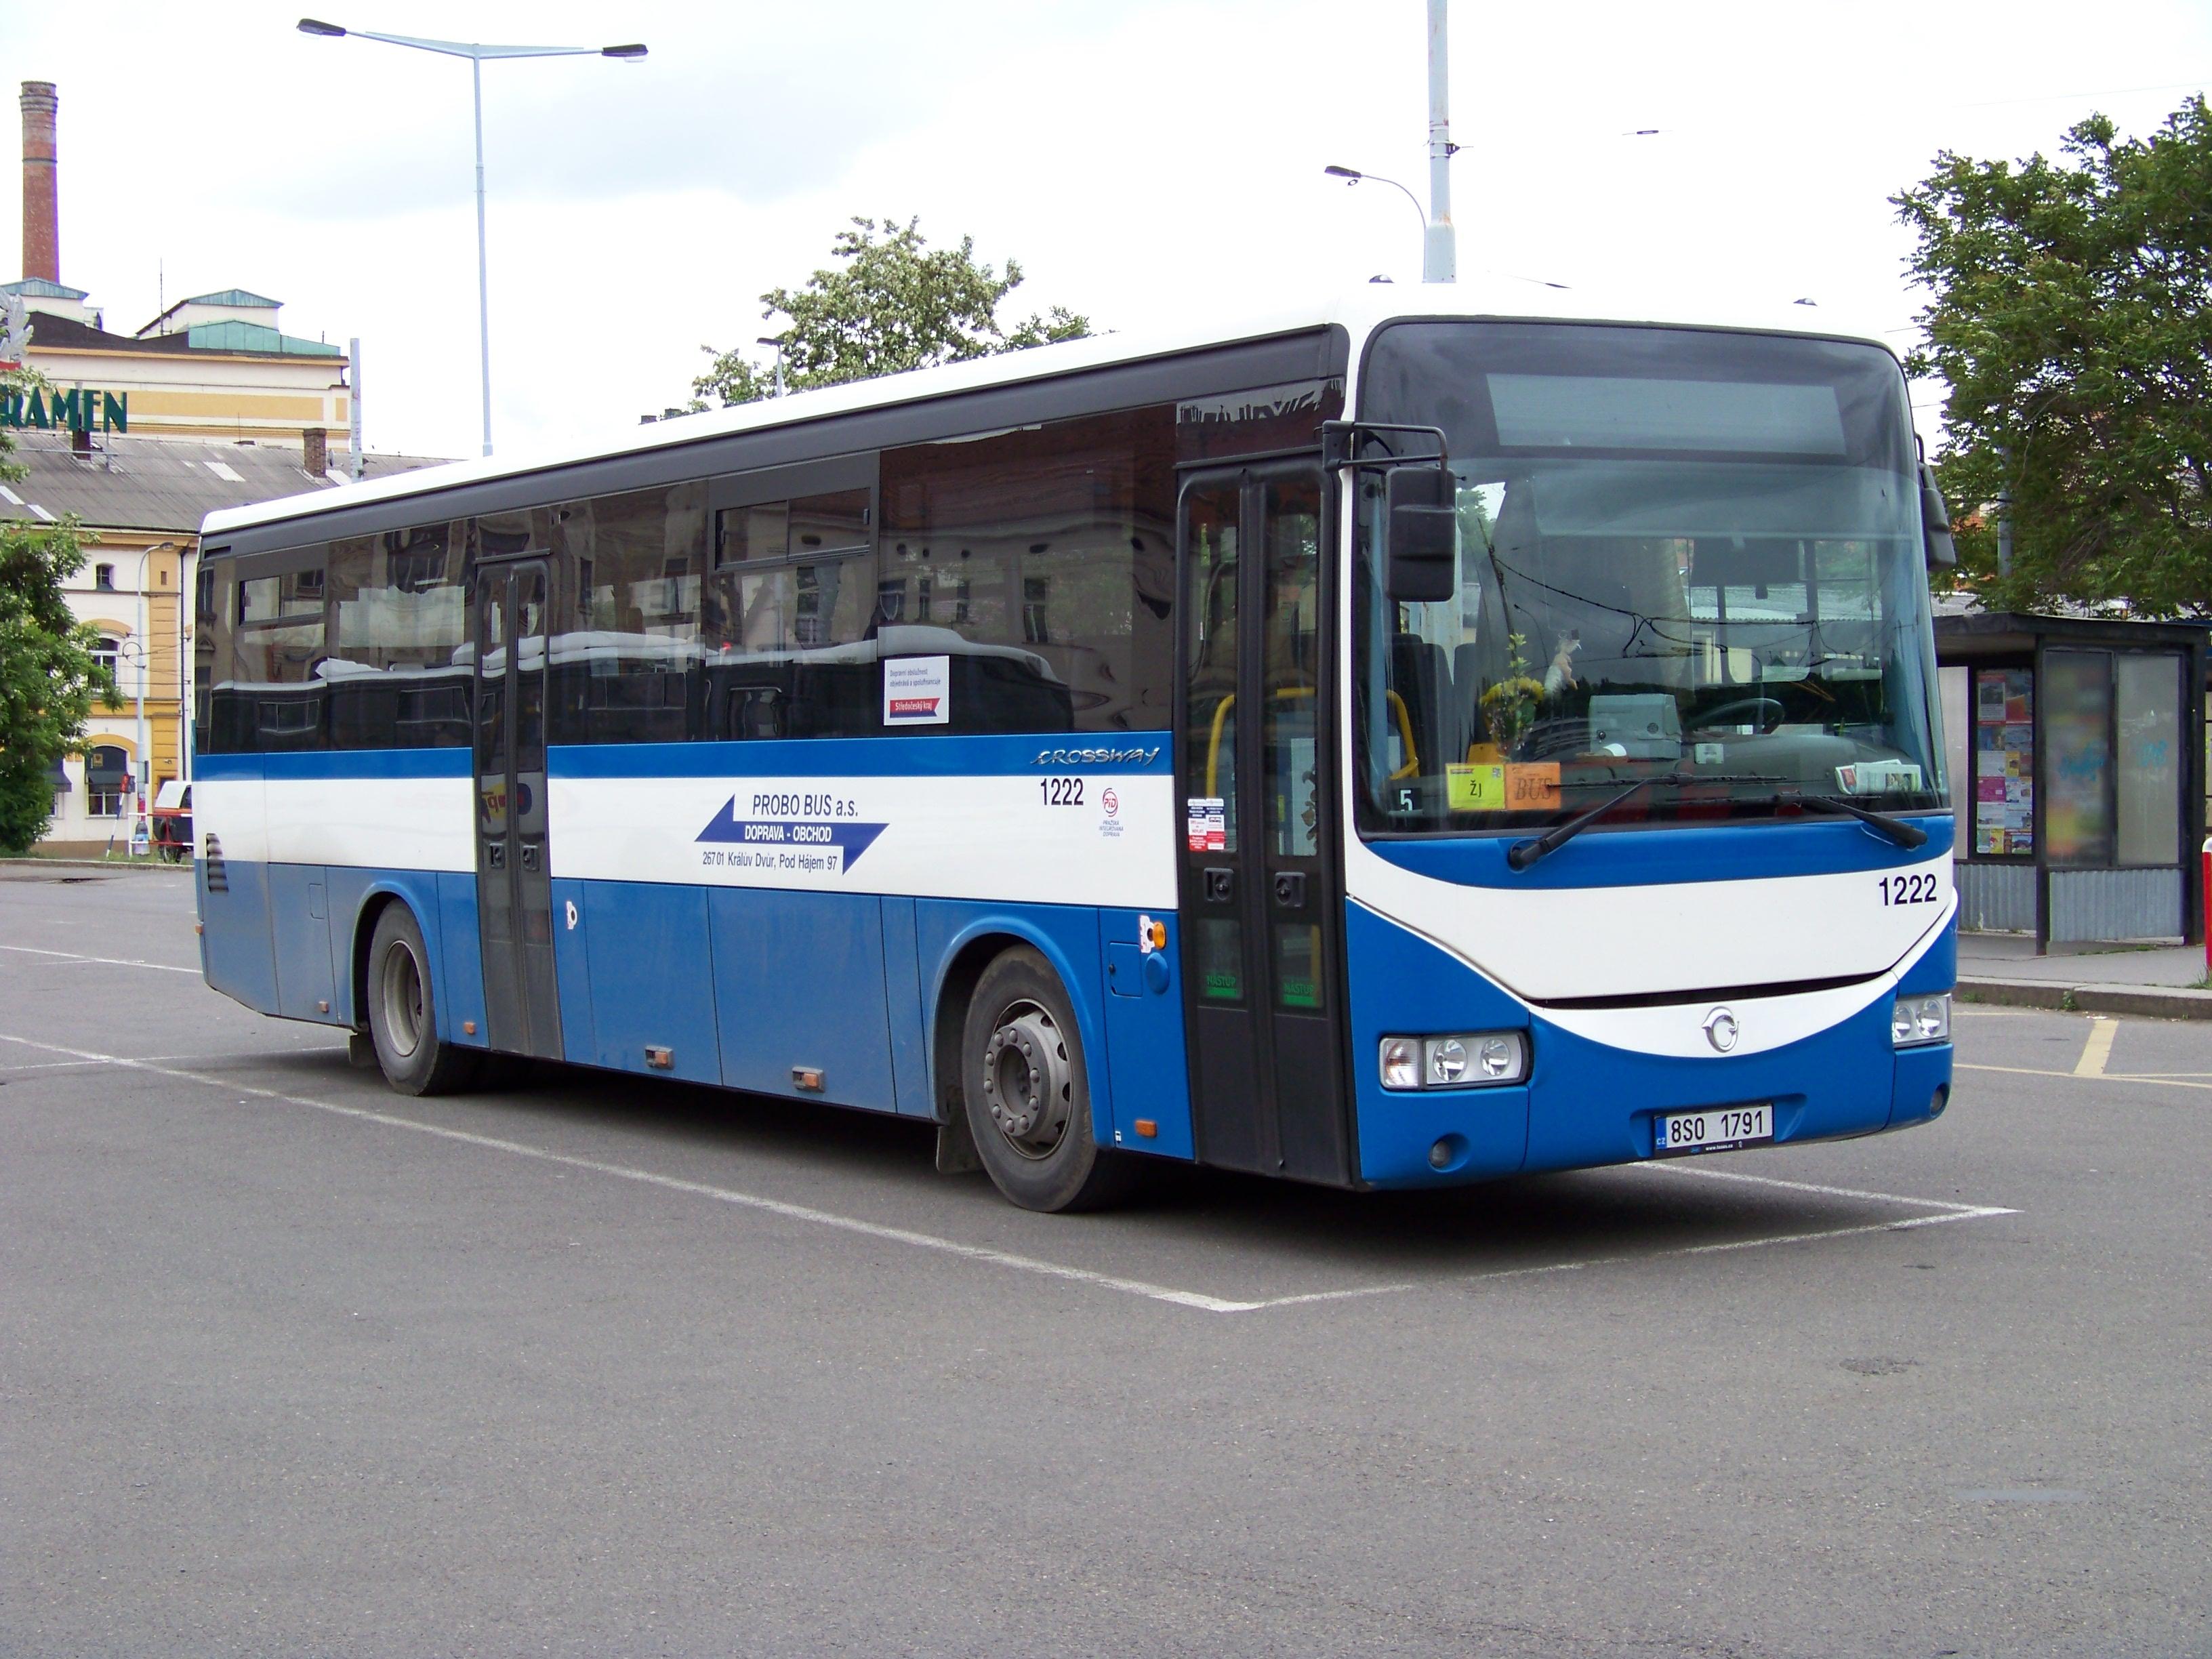 File:Probo bus 1222.jpg